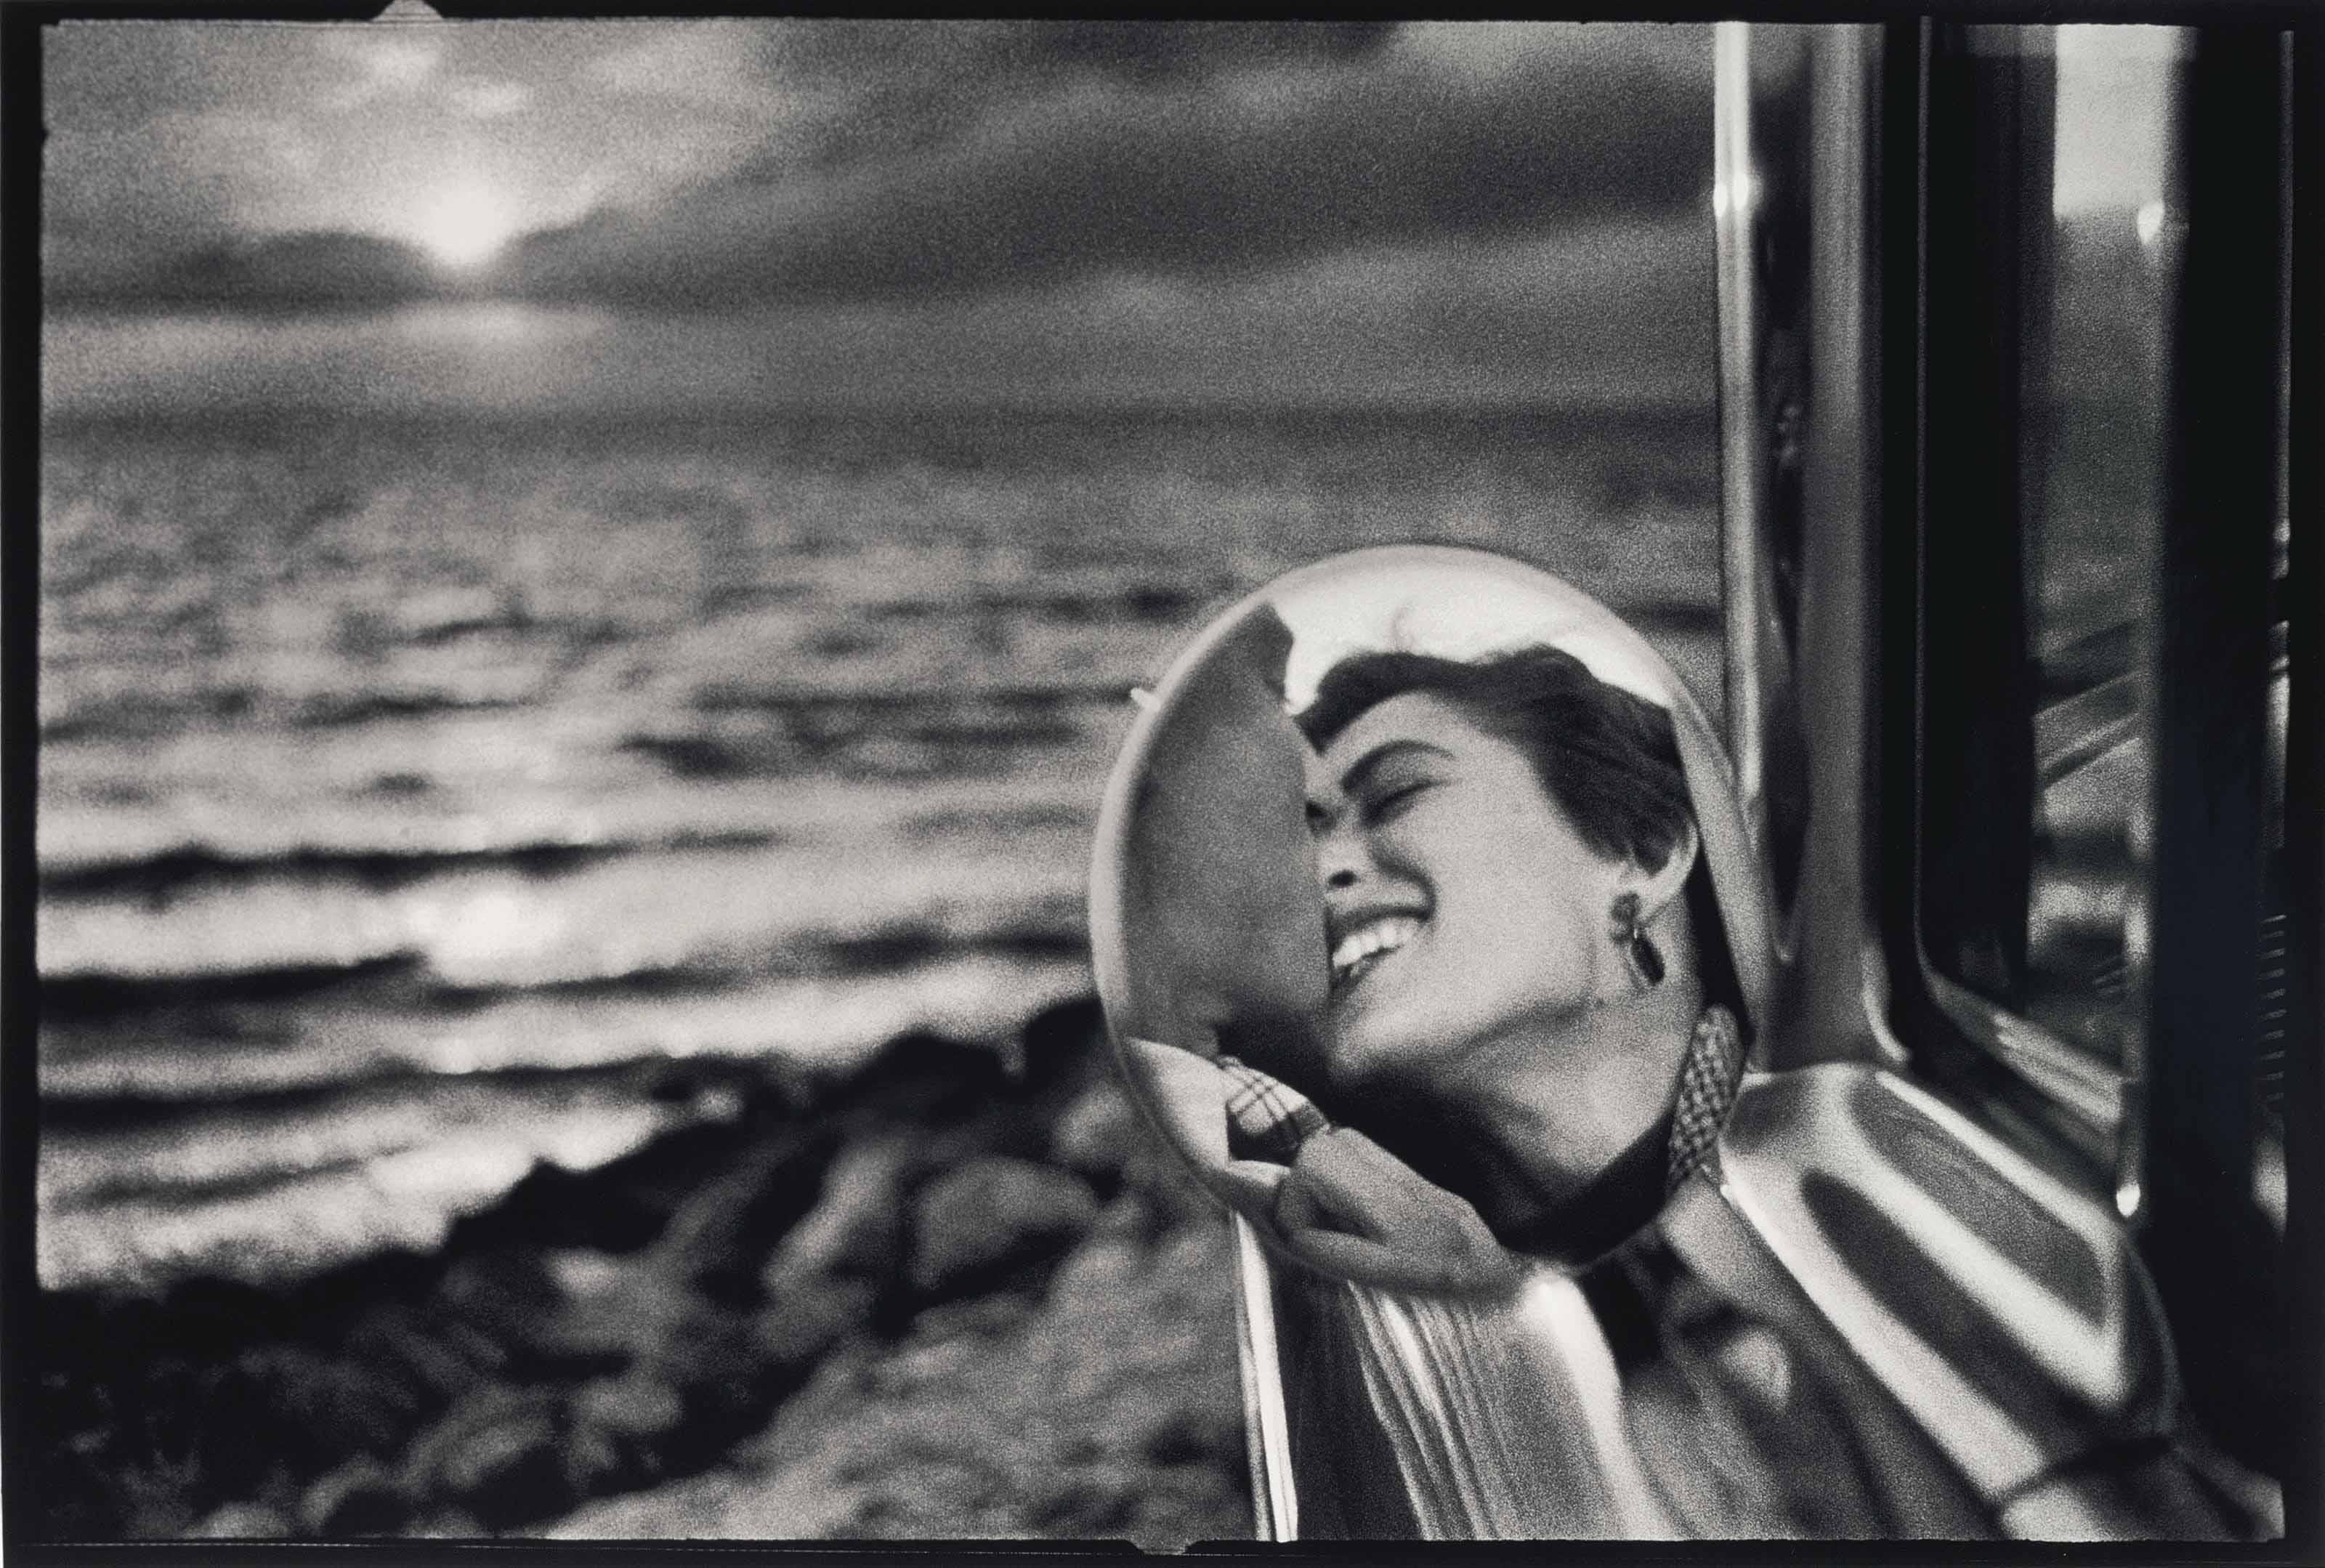 Santa Monica, California, 1955